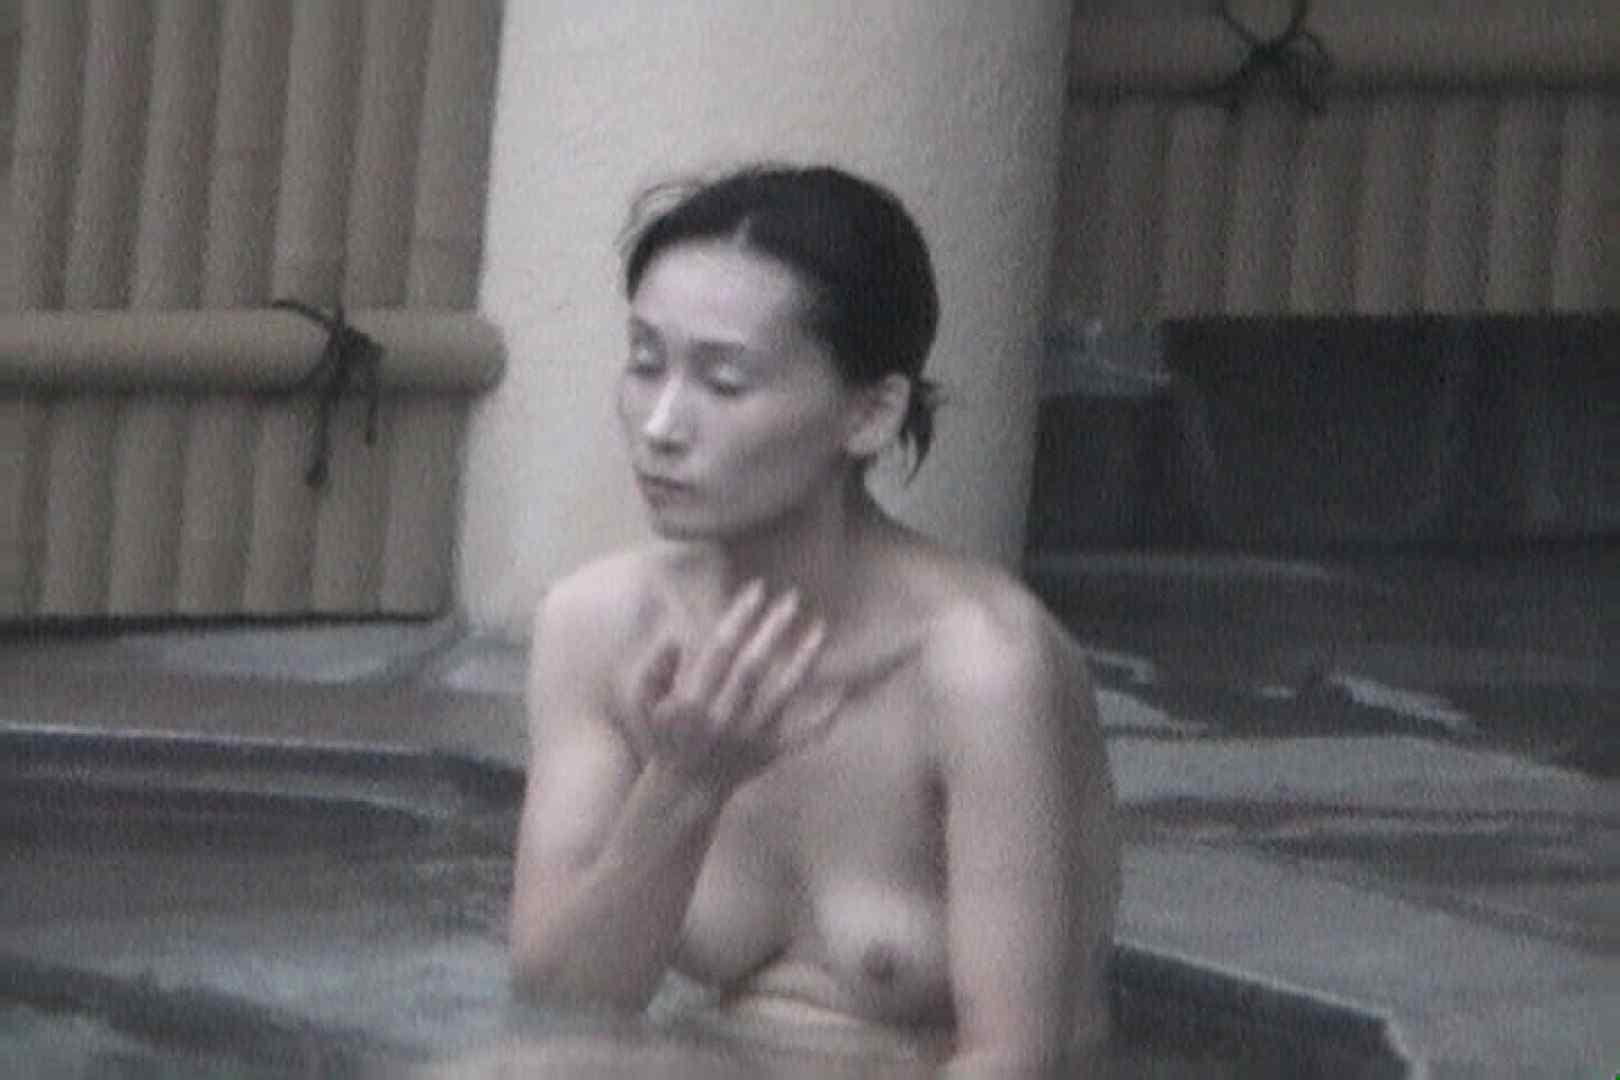 Aquaな露天風呂Vol.557 綺麗なOLたち  78枚 72